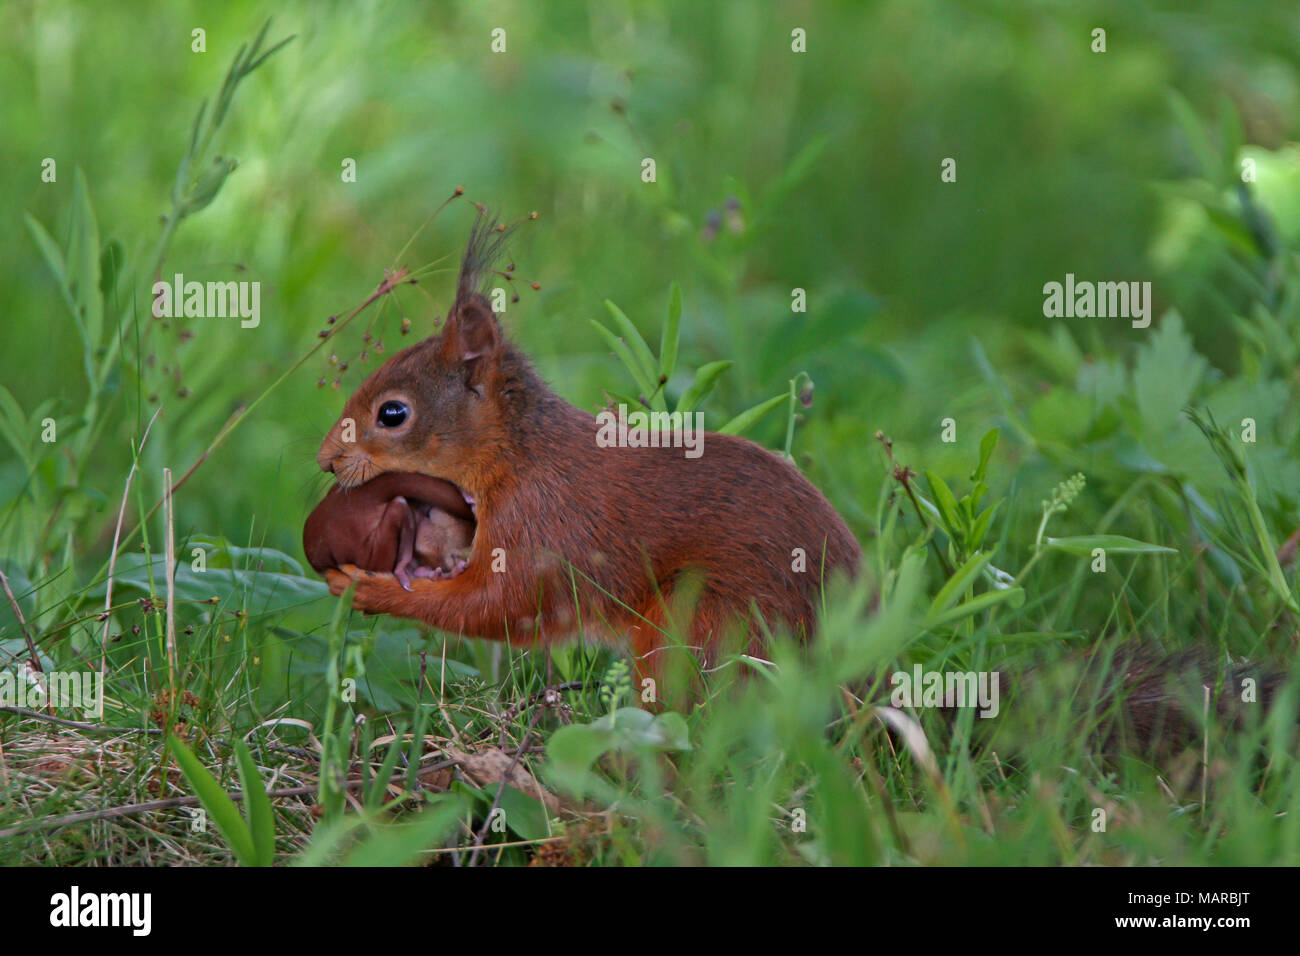 Red Squirrel (Sciurus vulgaris). Mother carrying young. Dalarna, Schweden - Stock Image